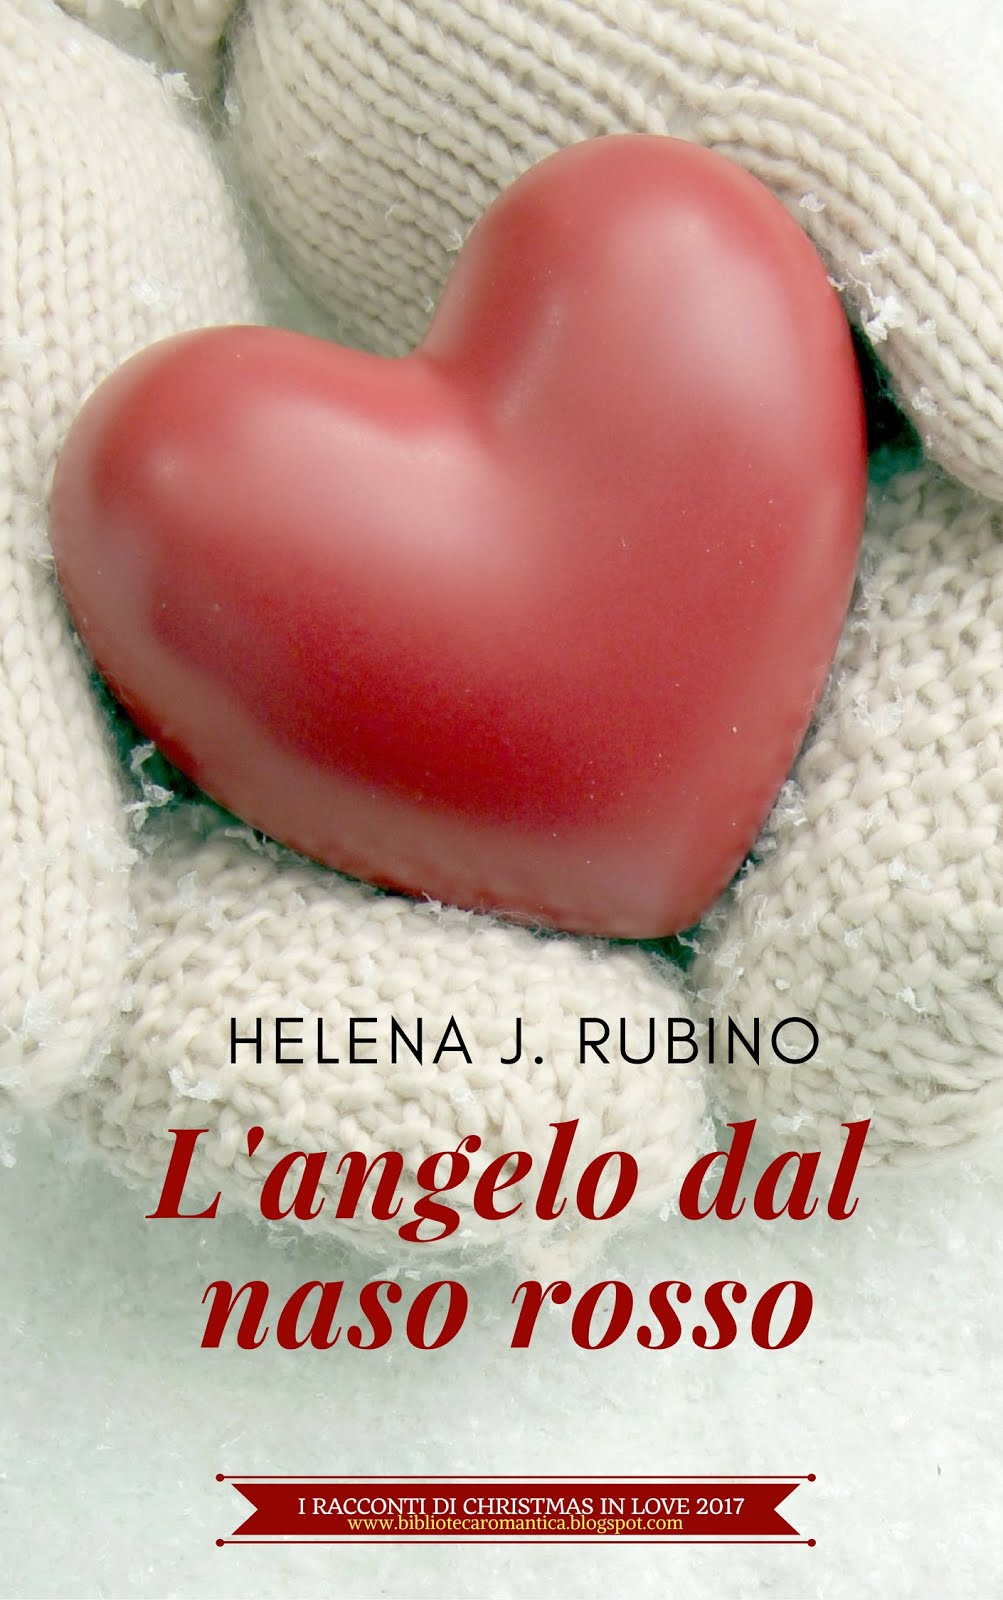 H.J.Rubino